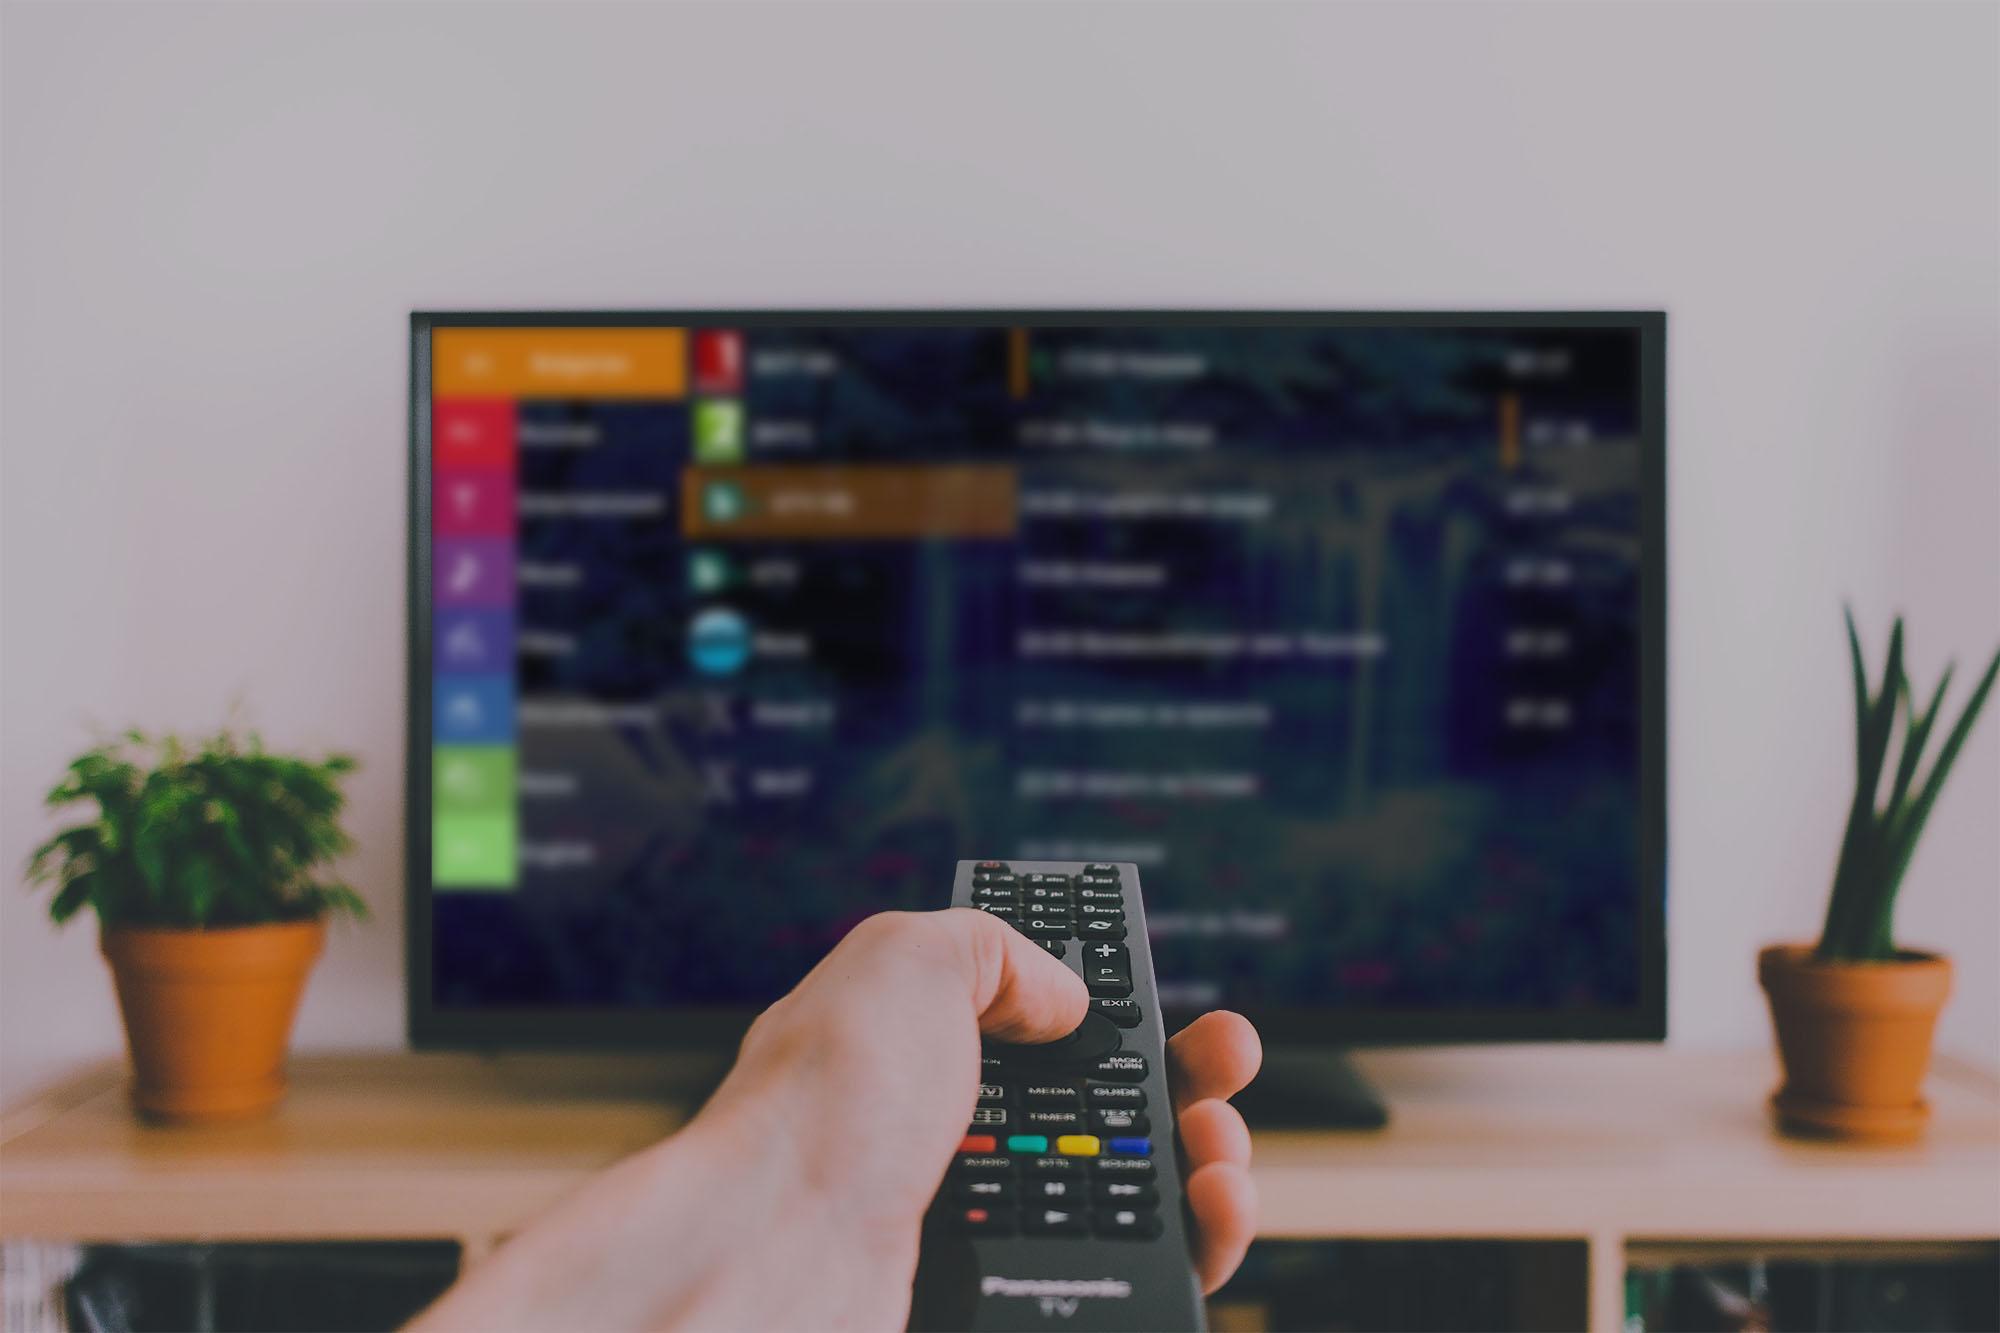 Smart TV apps development